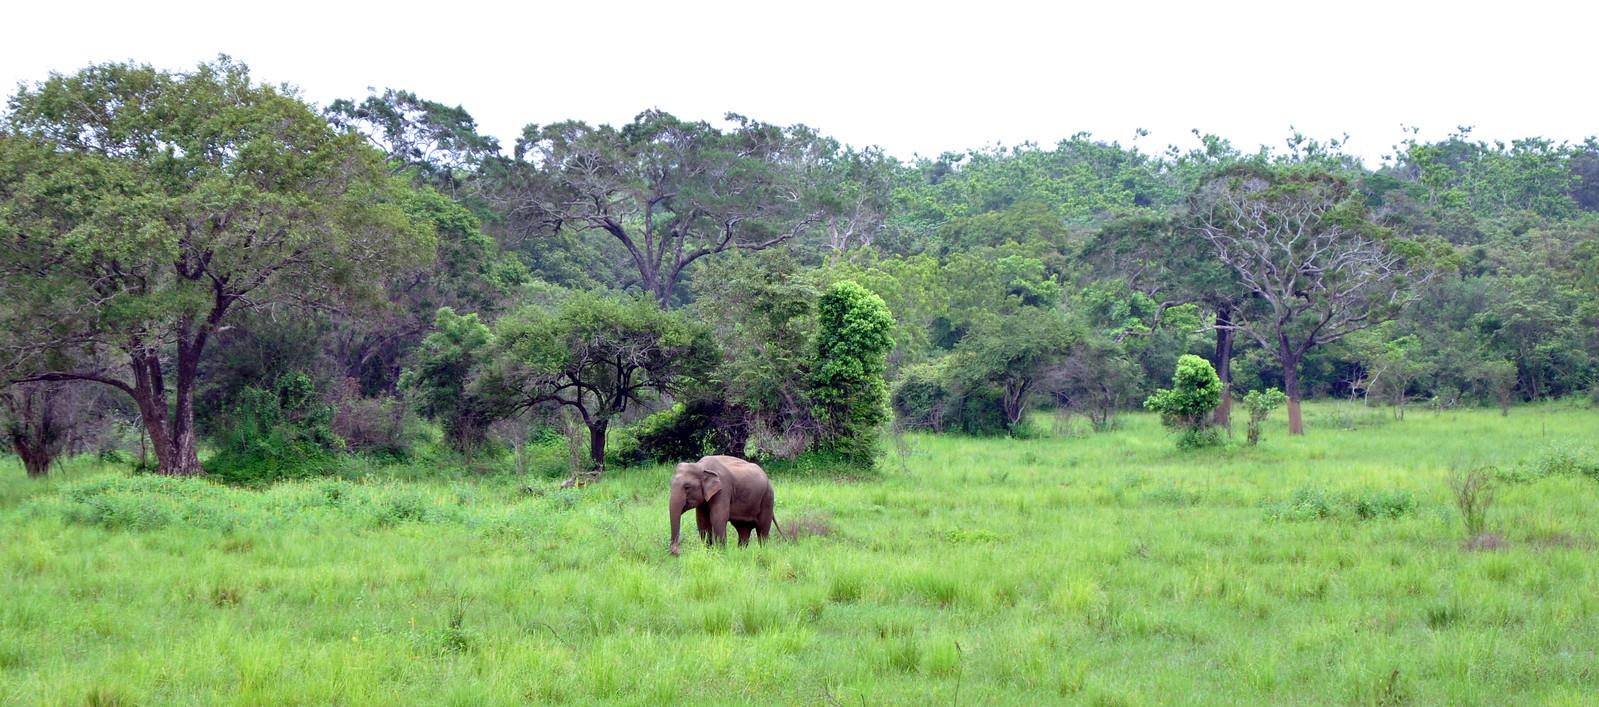 VER ELEFANTES SALVAJES EN SRI LANKA ver elefantes salvajes en sri lanka - 32032828947 debdd2d292 h - Ver elefantes salvajes en Sri Lanka